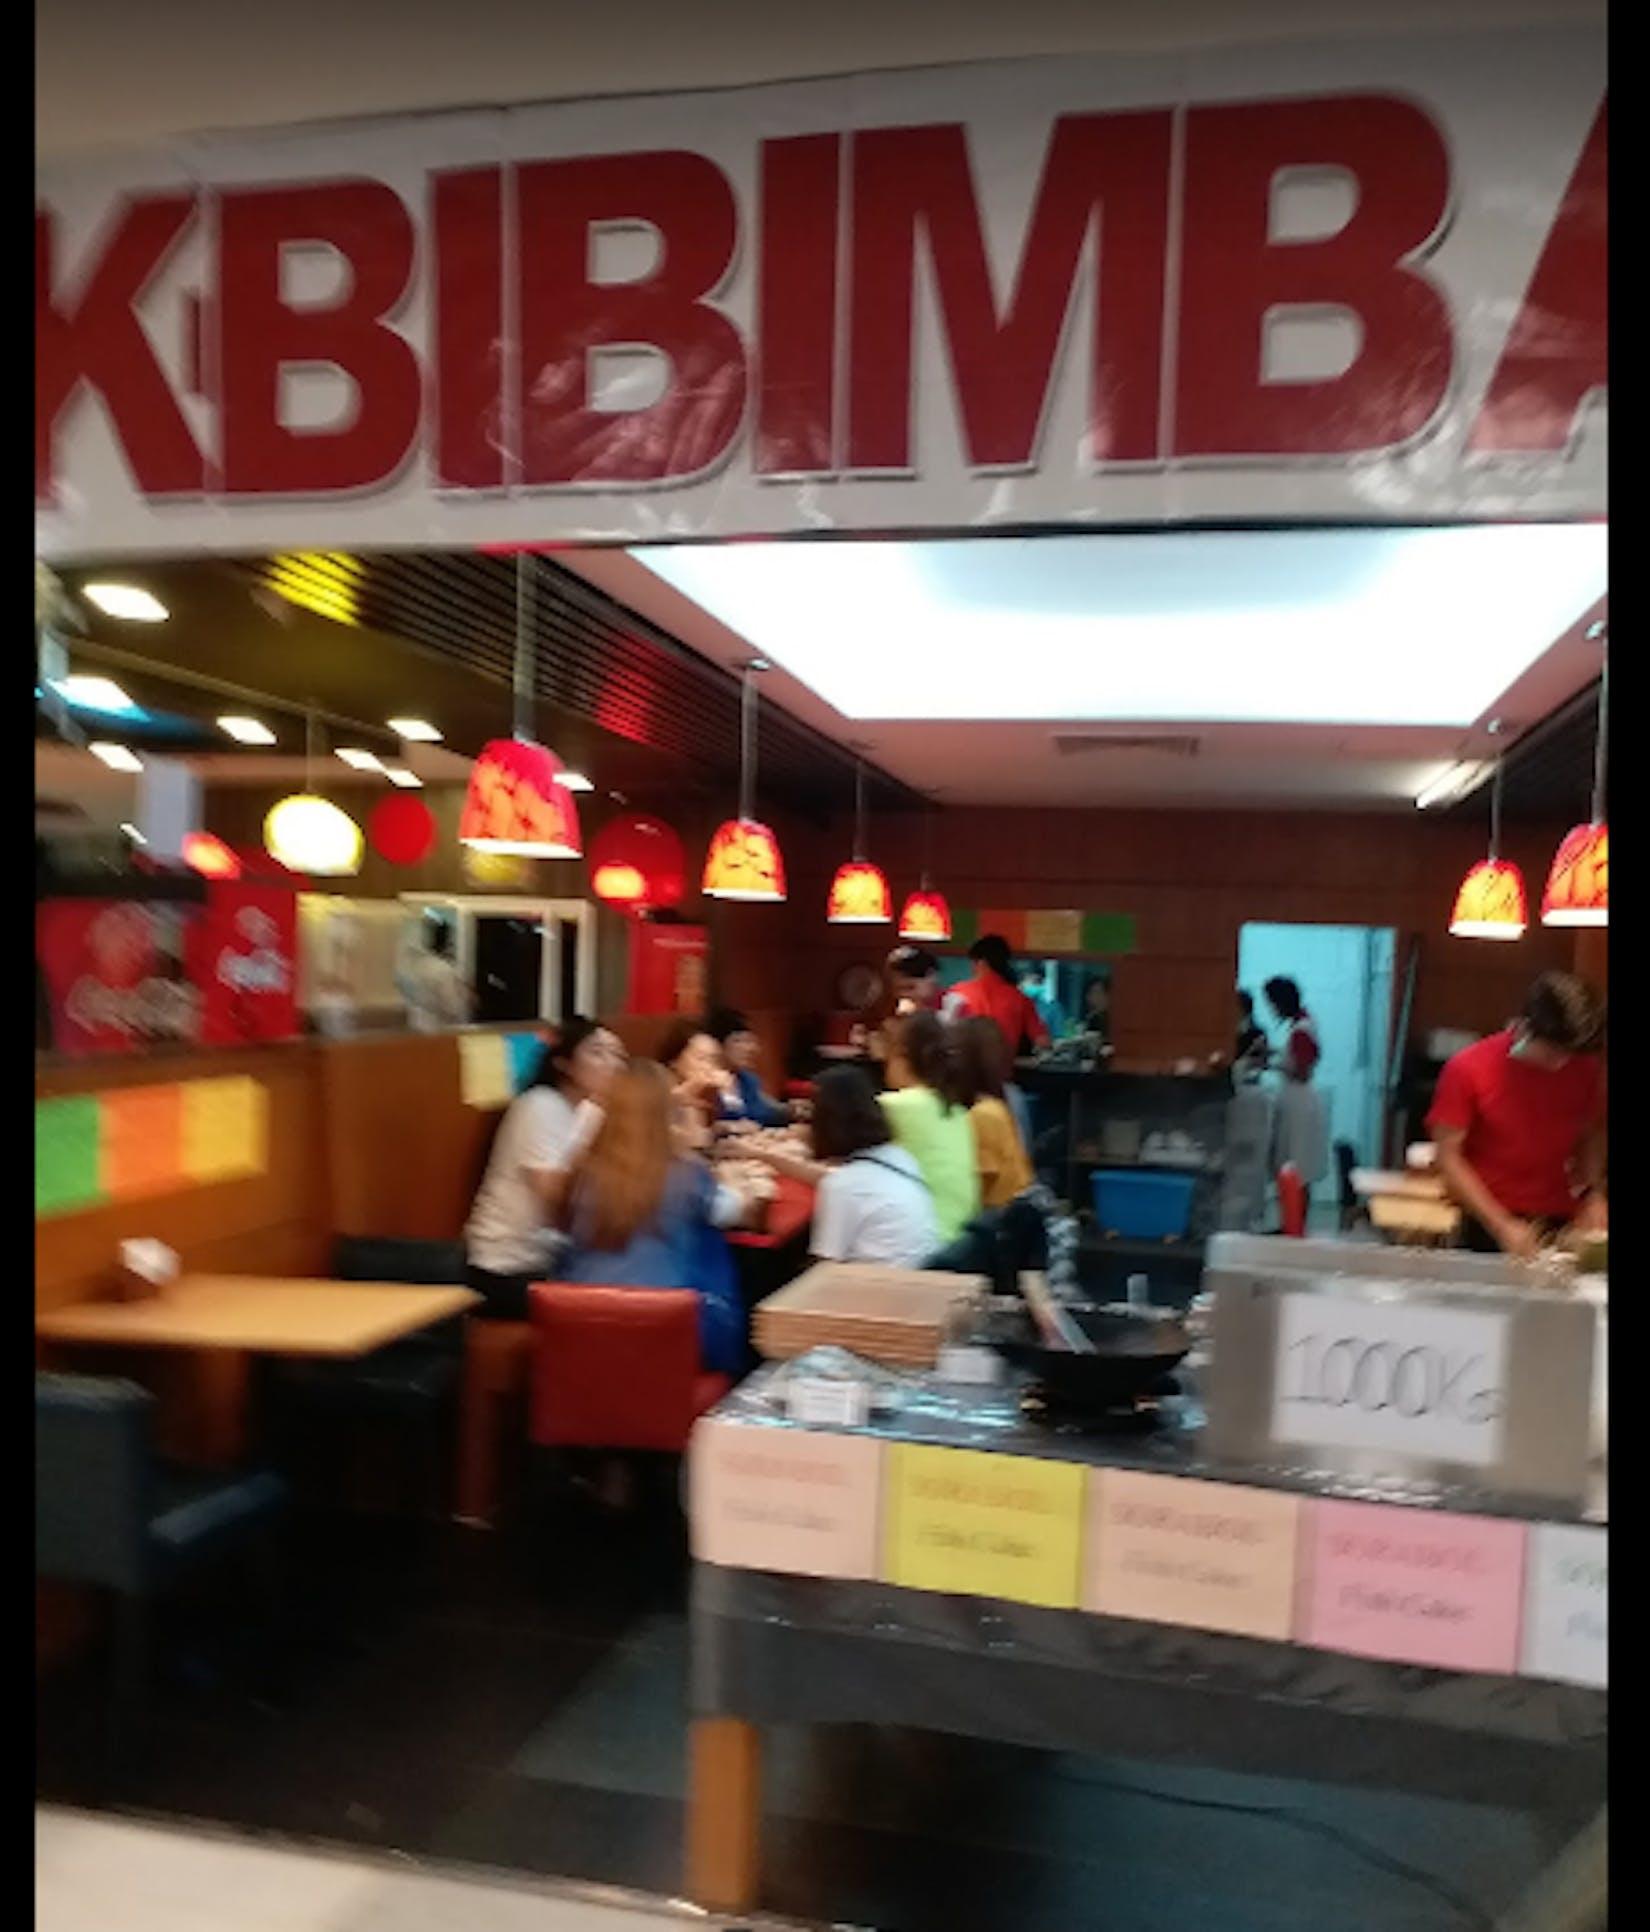 K-BiBimBap ( Korea Restaurant ) | yathar